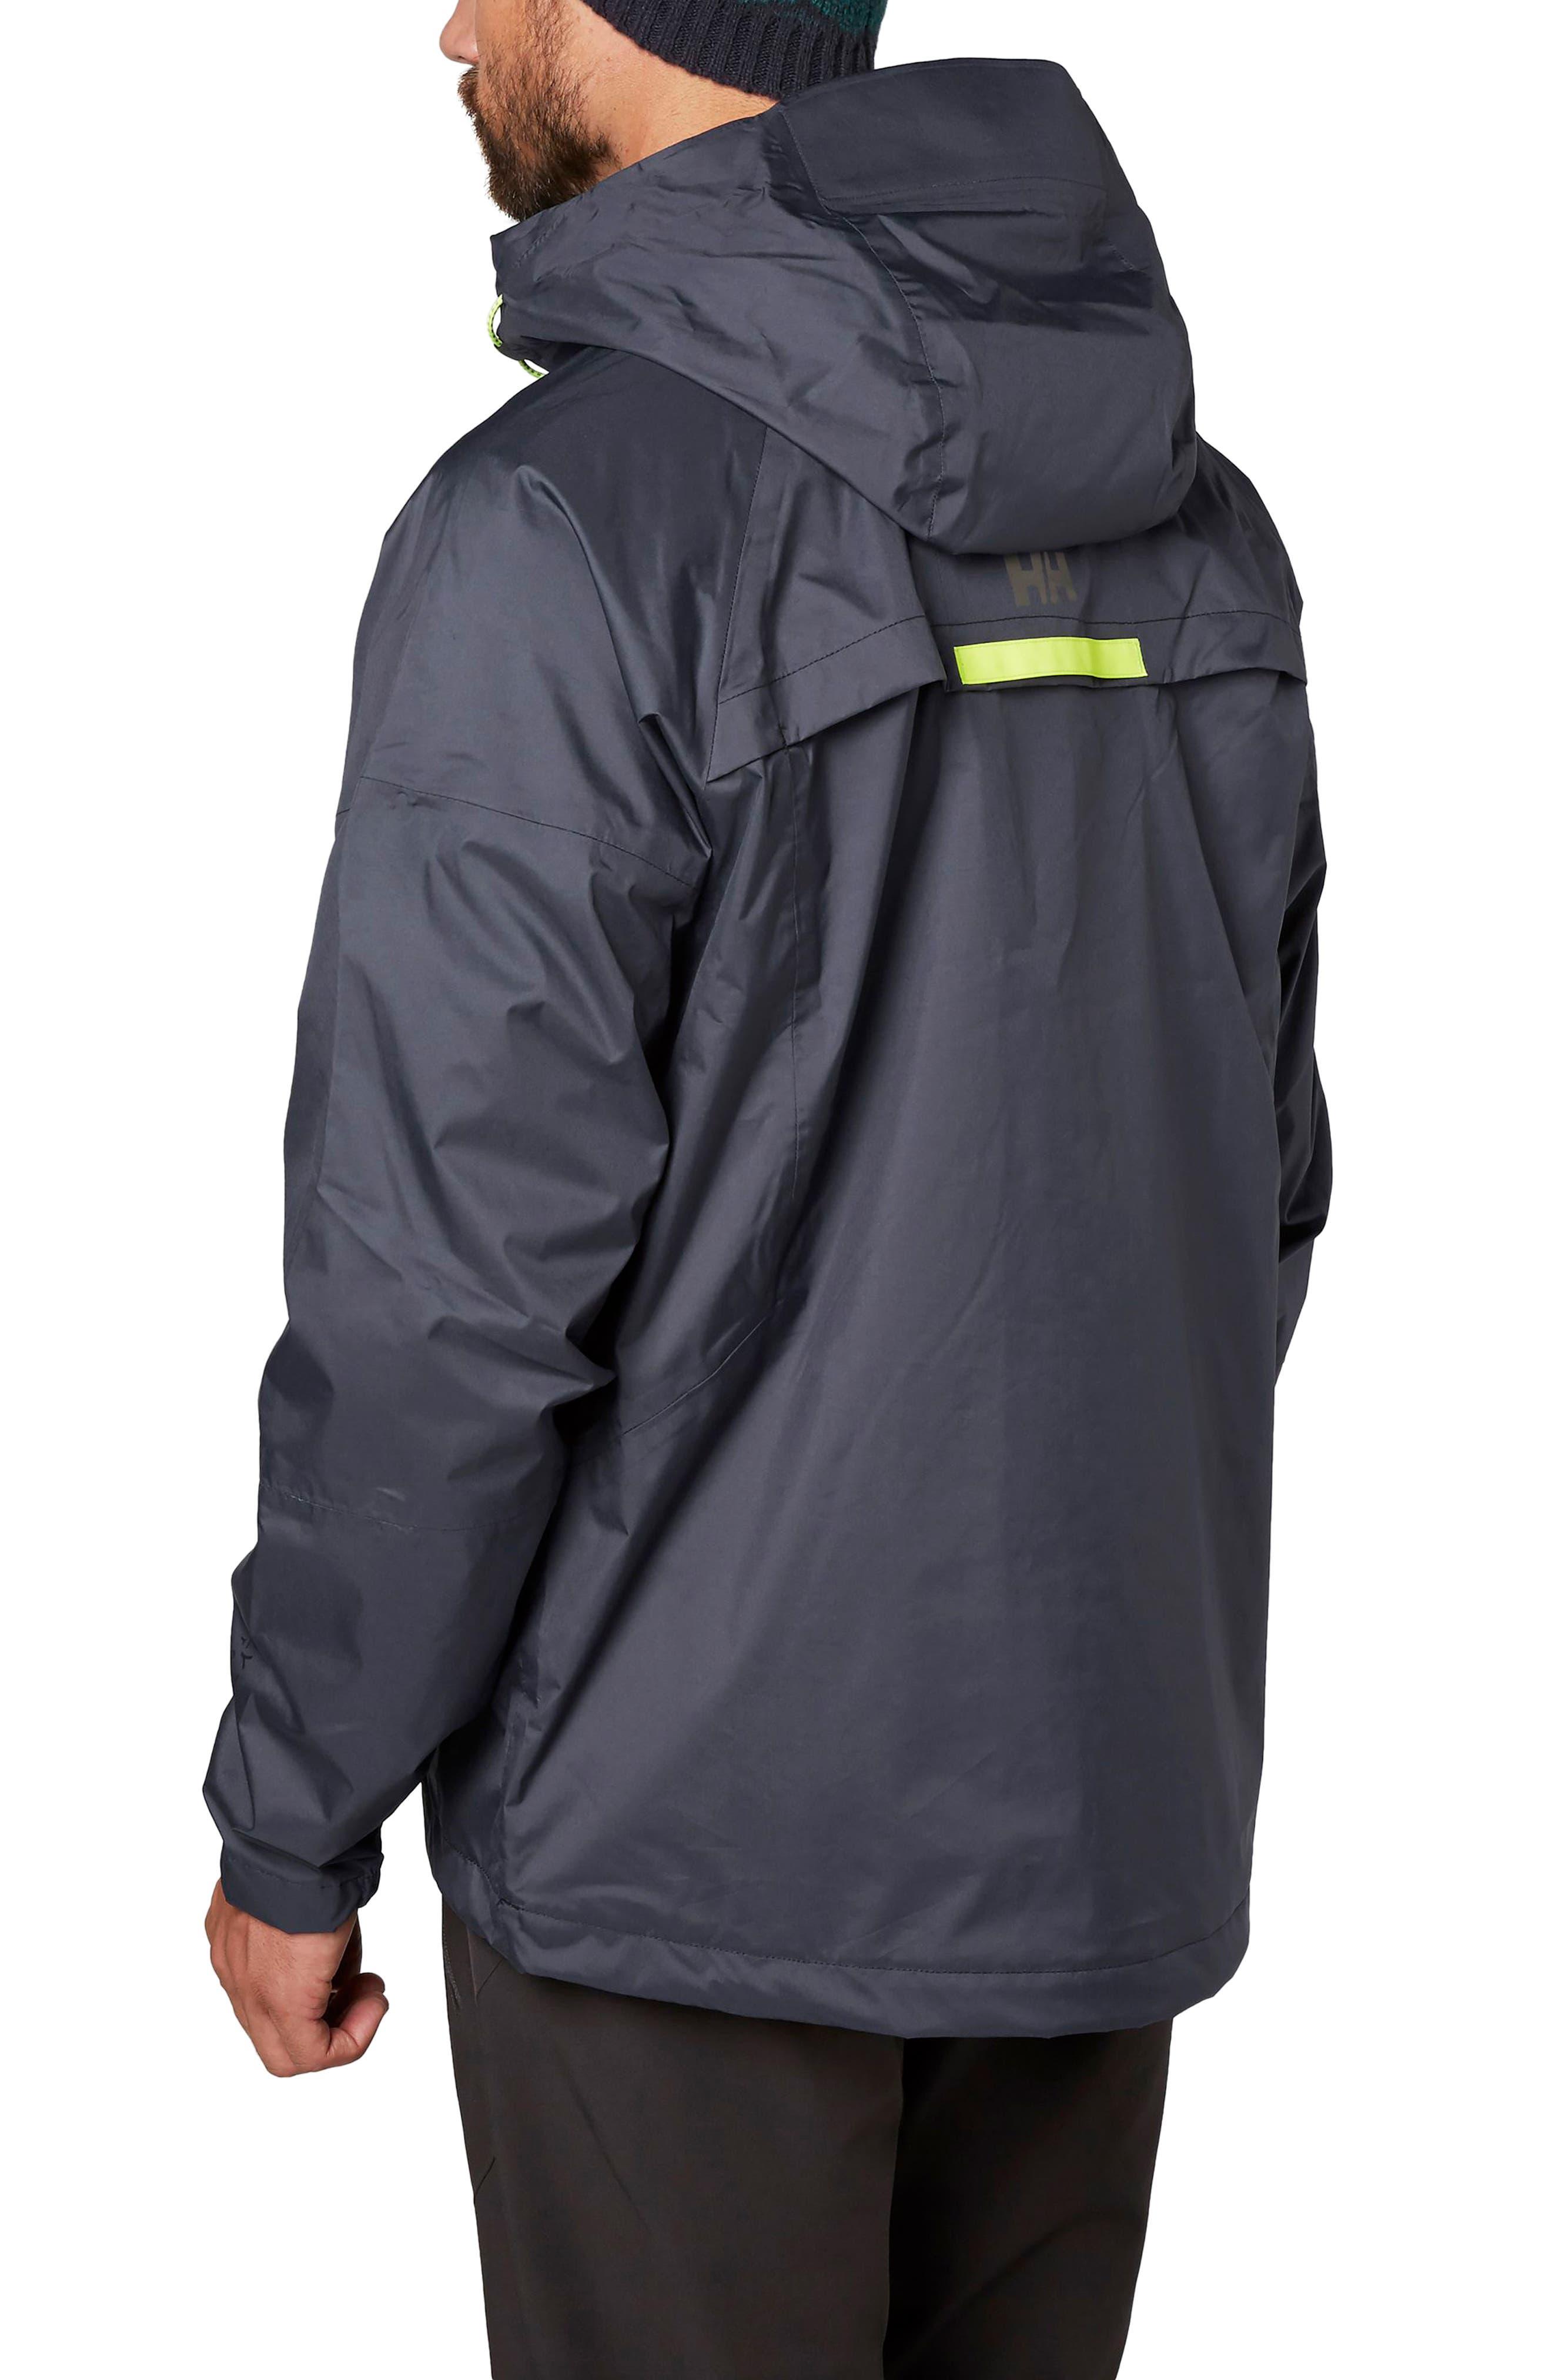 Loke Saga Waterproof Jacket,                             Alternate thumbnail 2, color,                             Graphite Blue